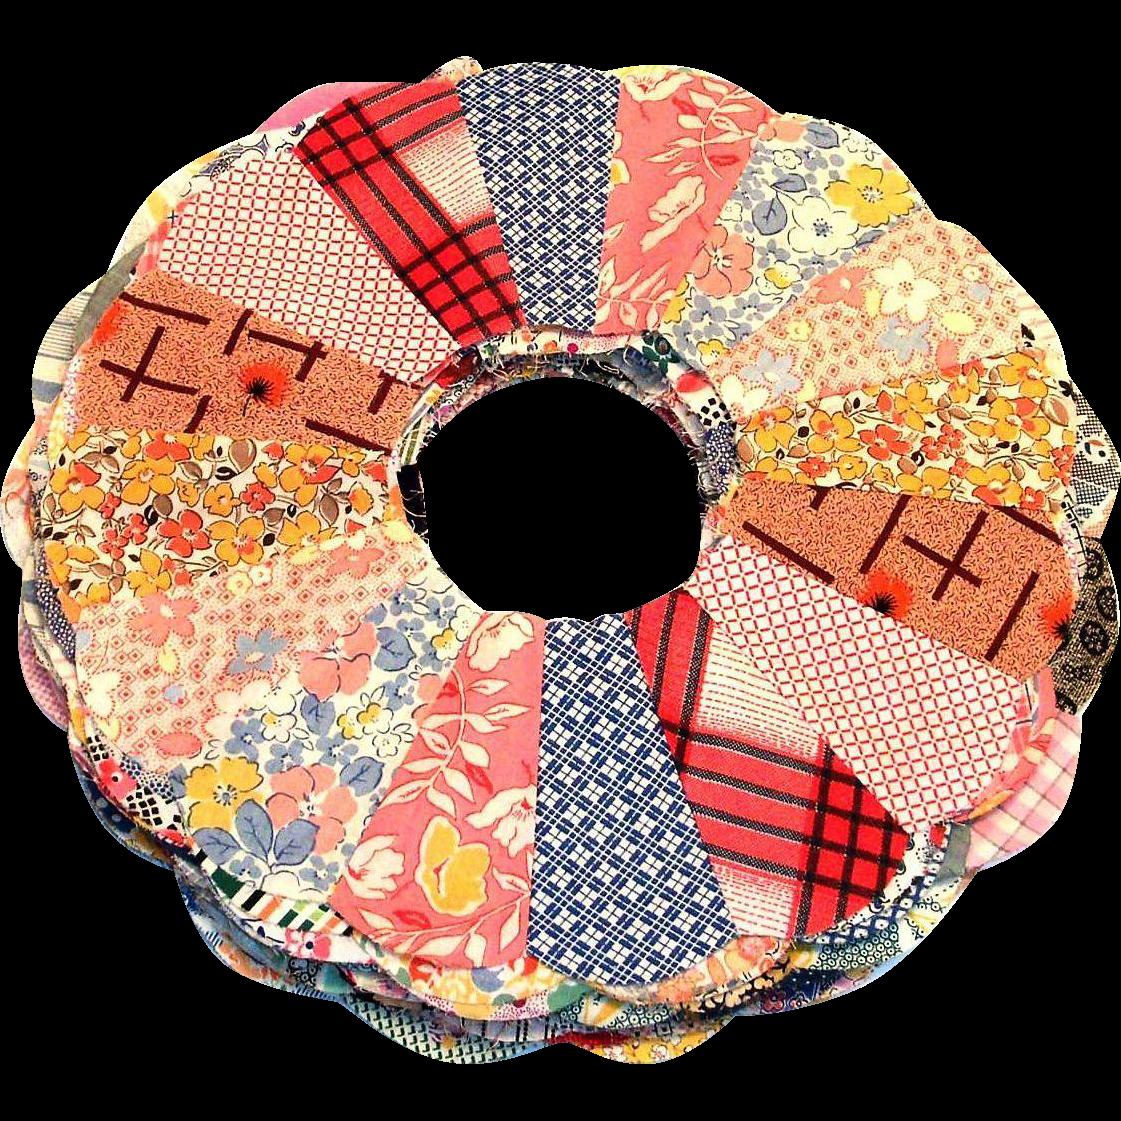 24 Vintage Dresden Design Quilt Pieces